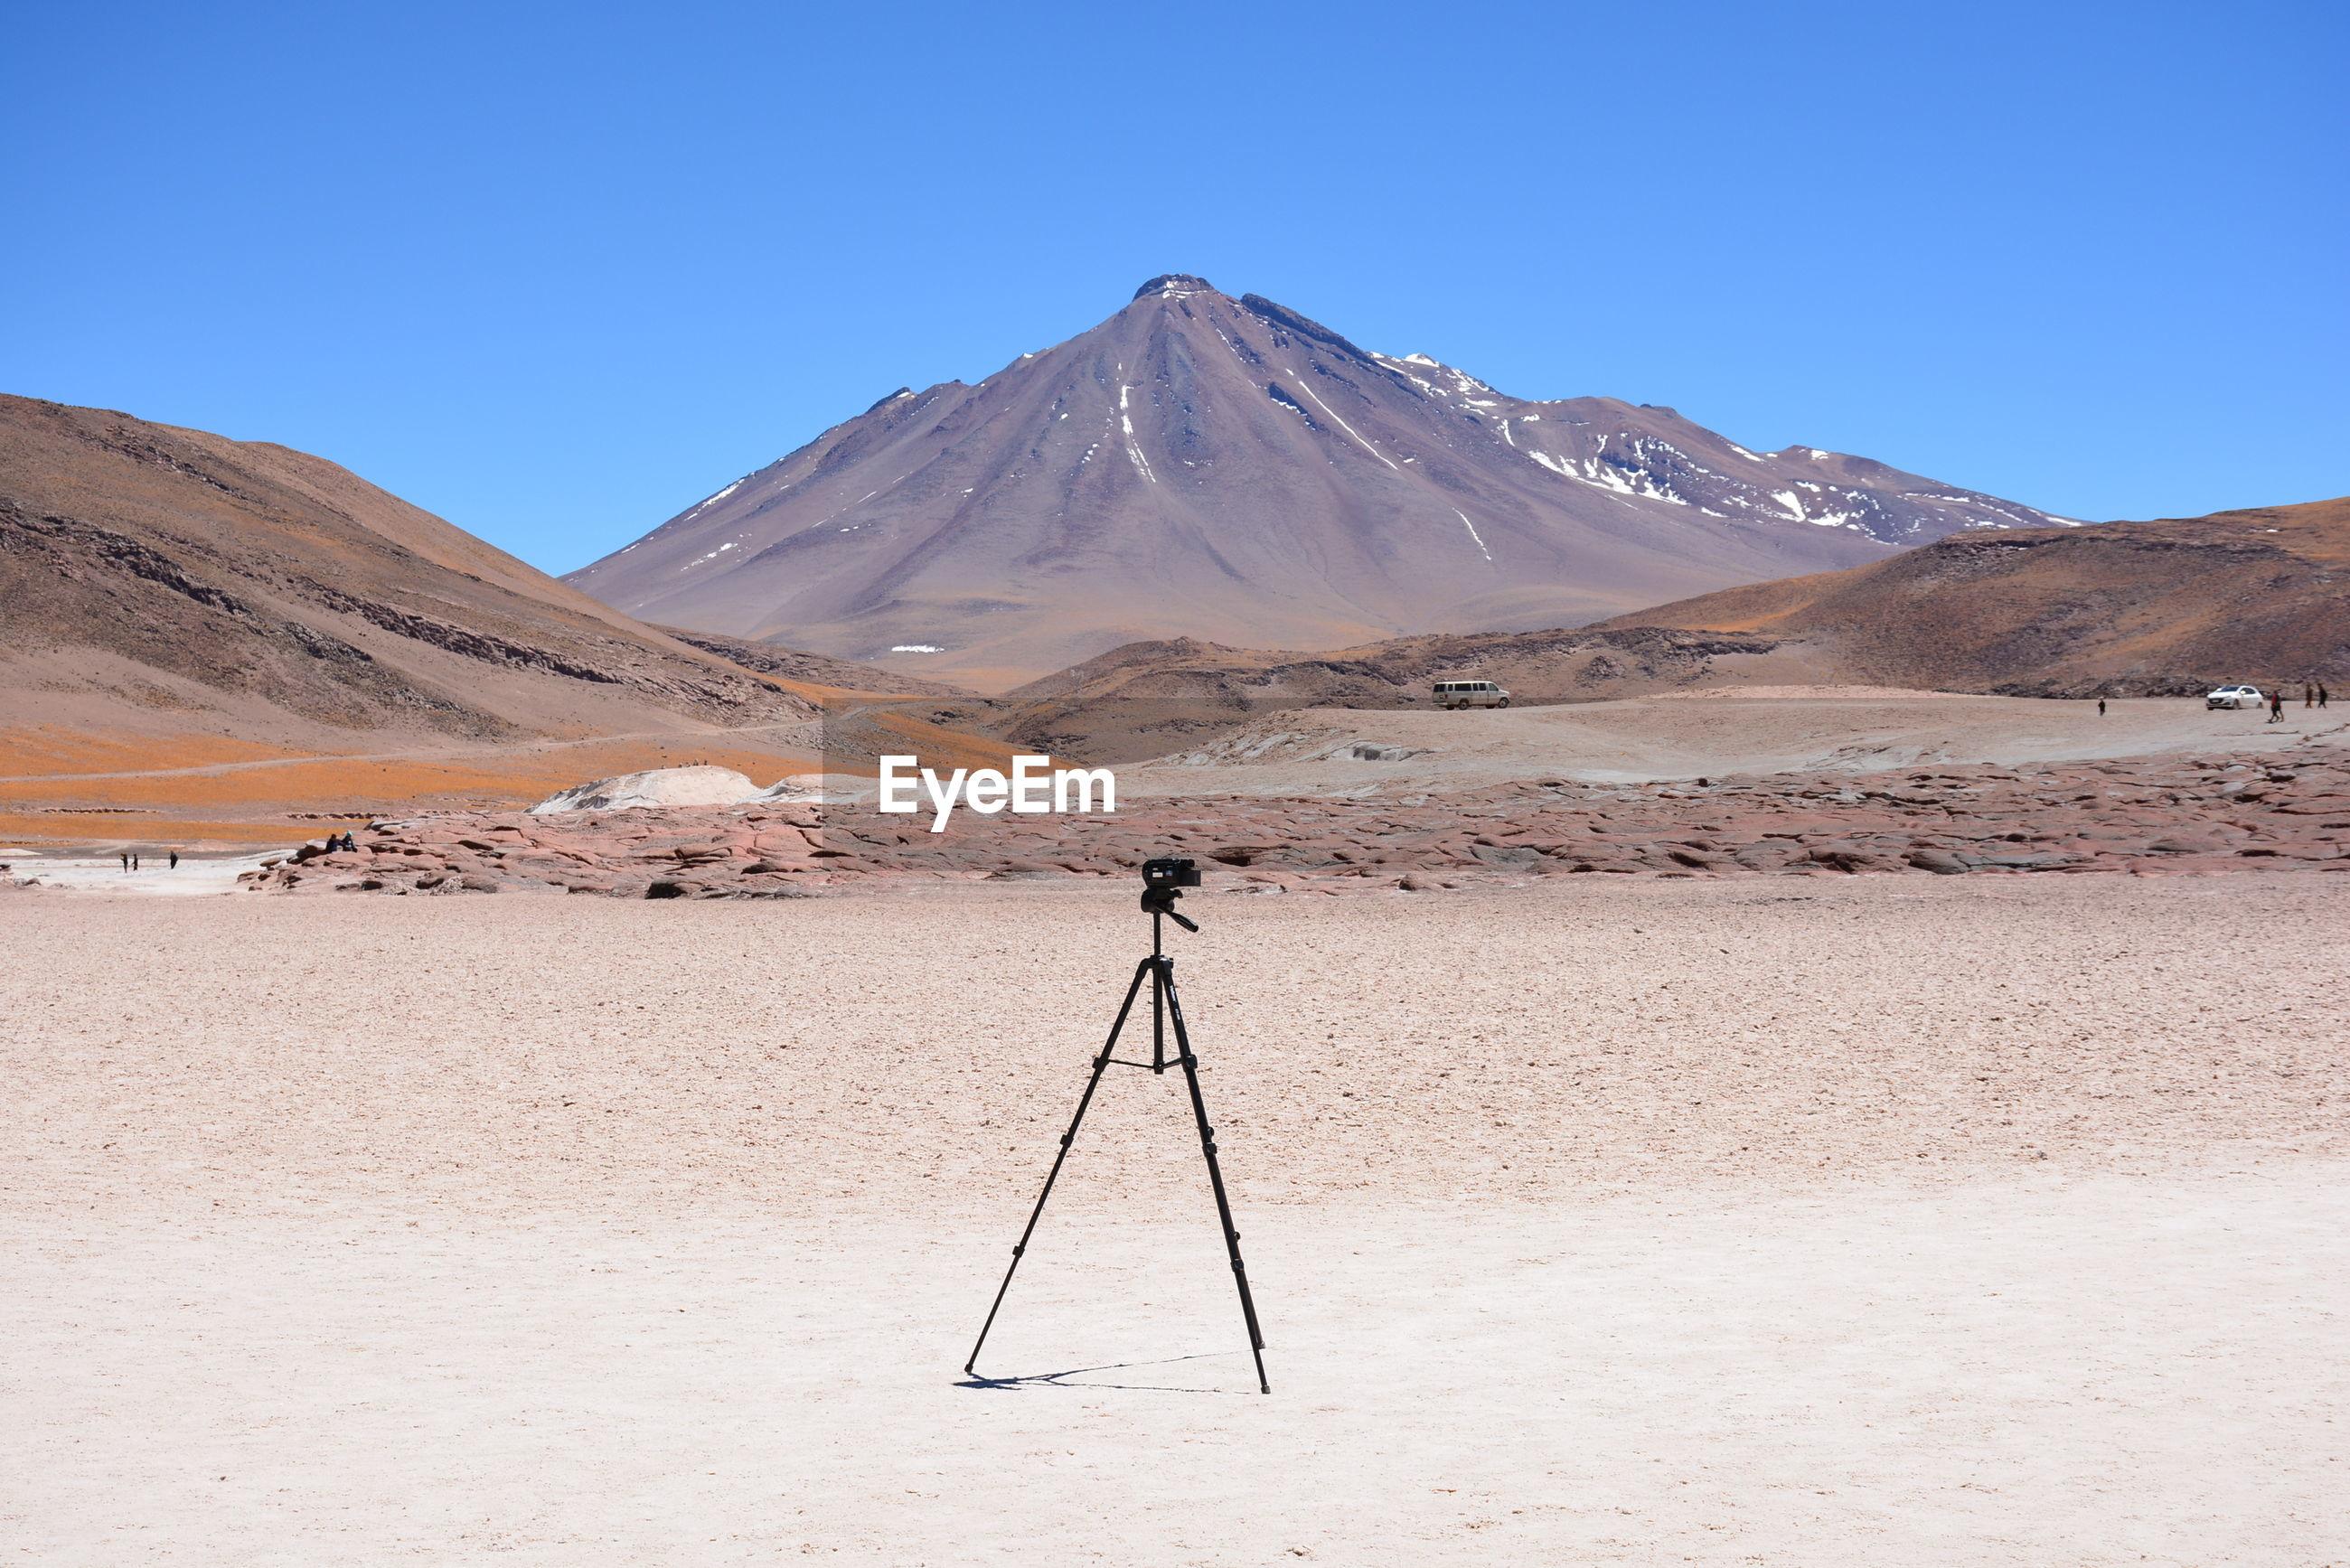 Tripod in desert against clear sky